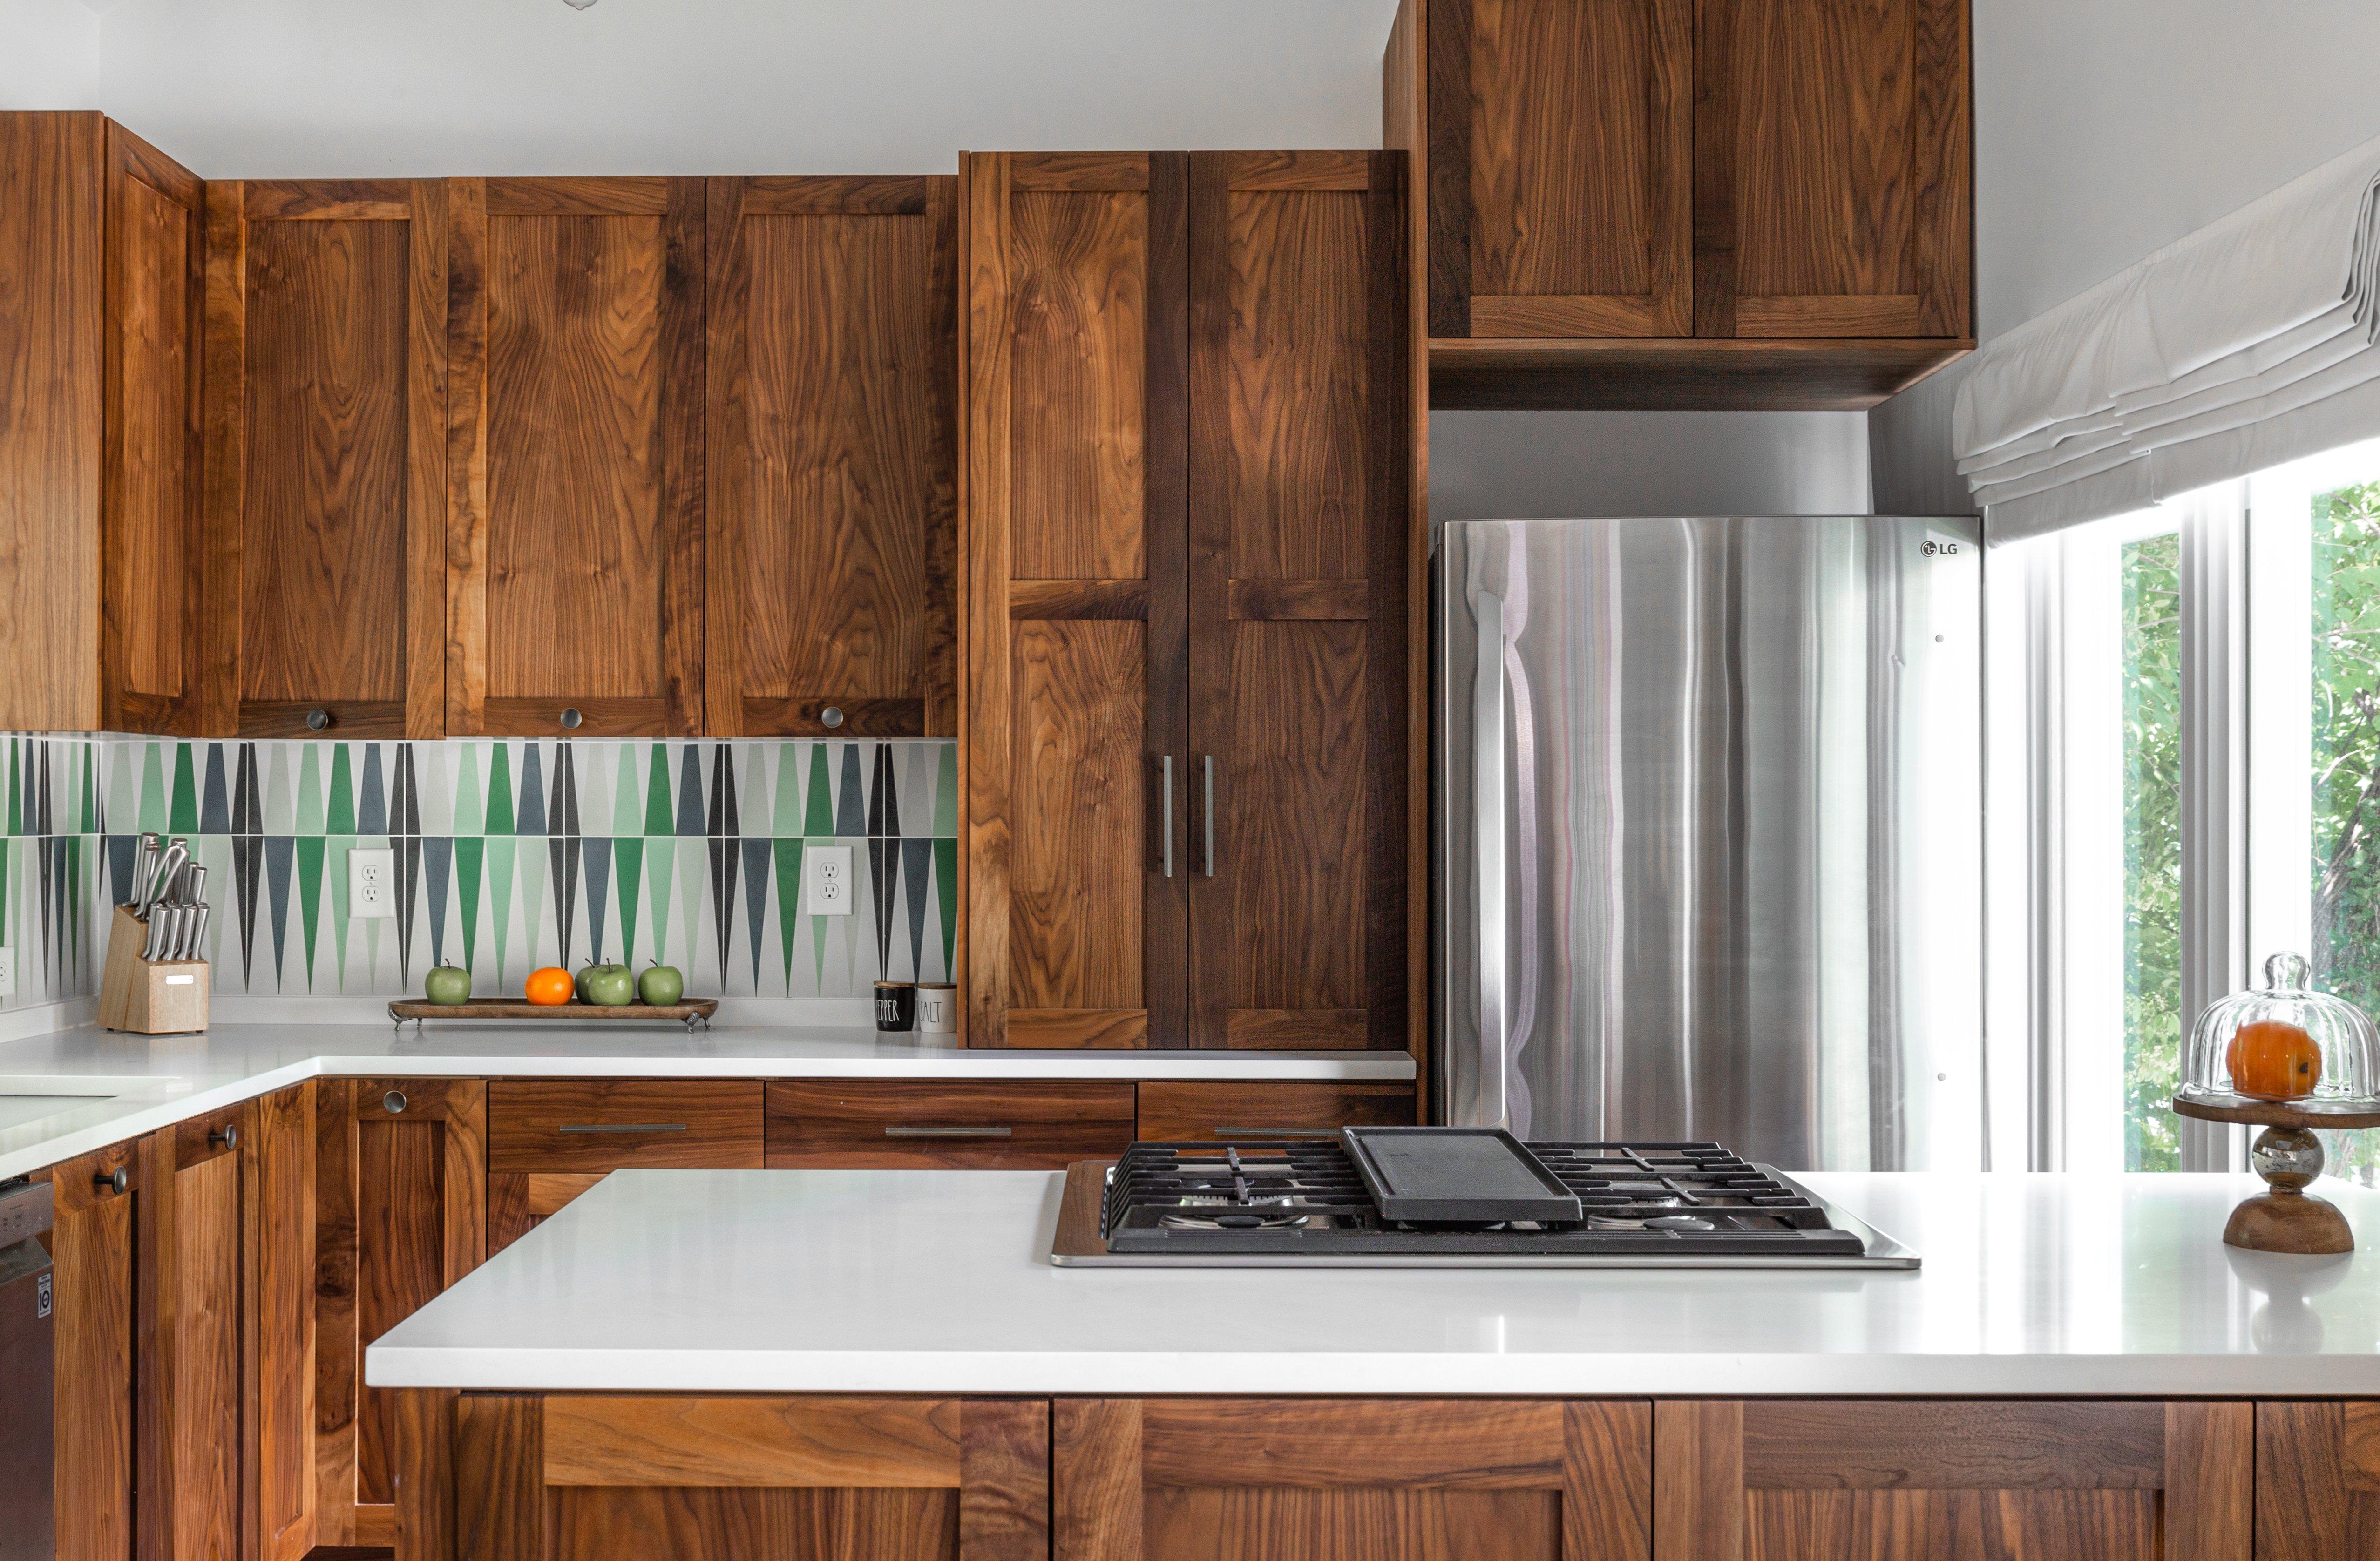 13 kitchen 20210721-IMG_0234-HDR.jpg